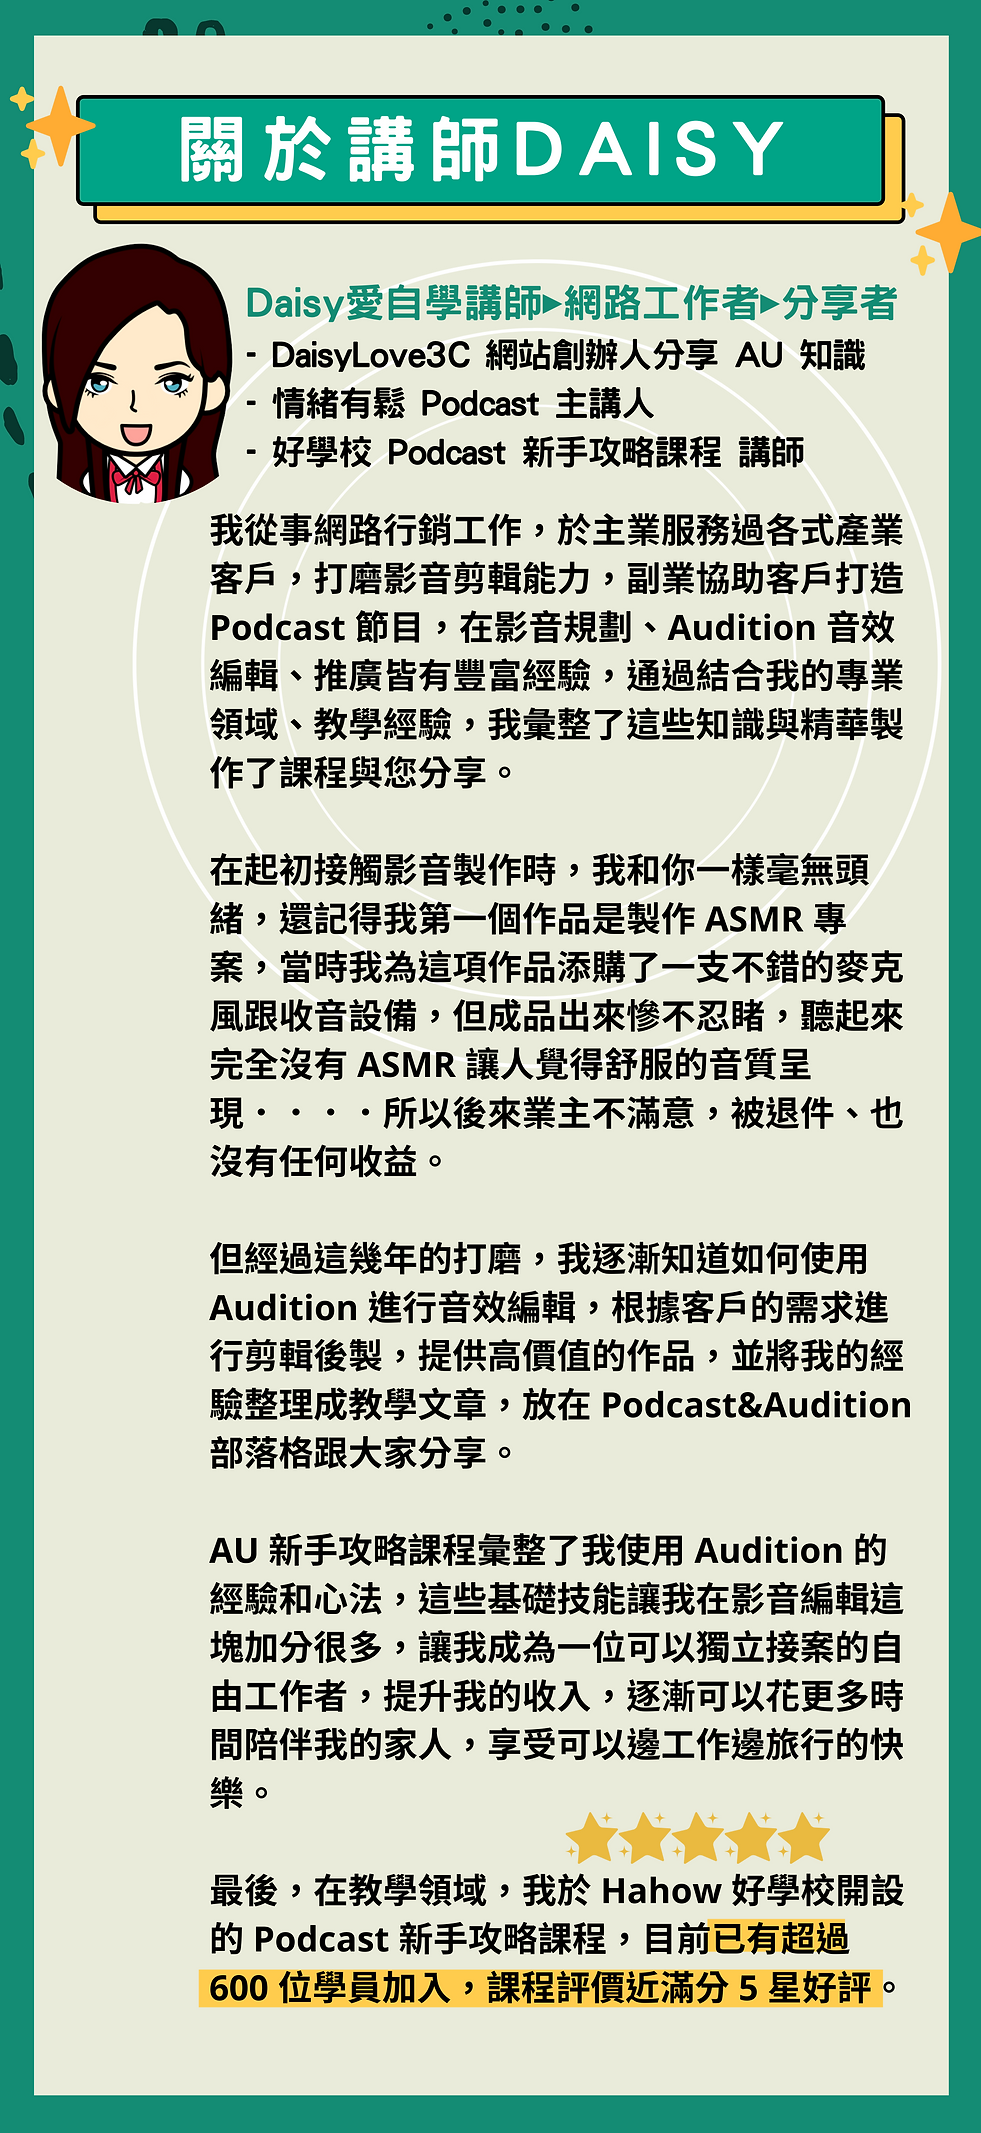 (A) 手機板- (7) 關於講師 - AU 新手攻略課程 (1).png